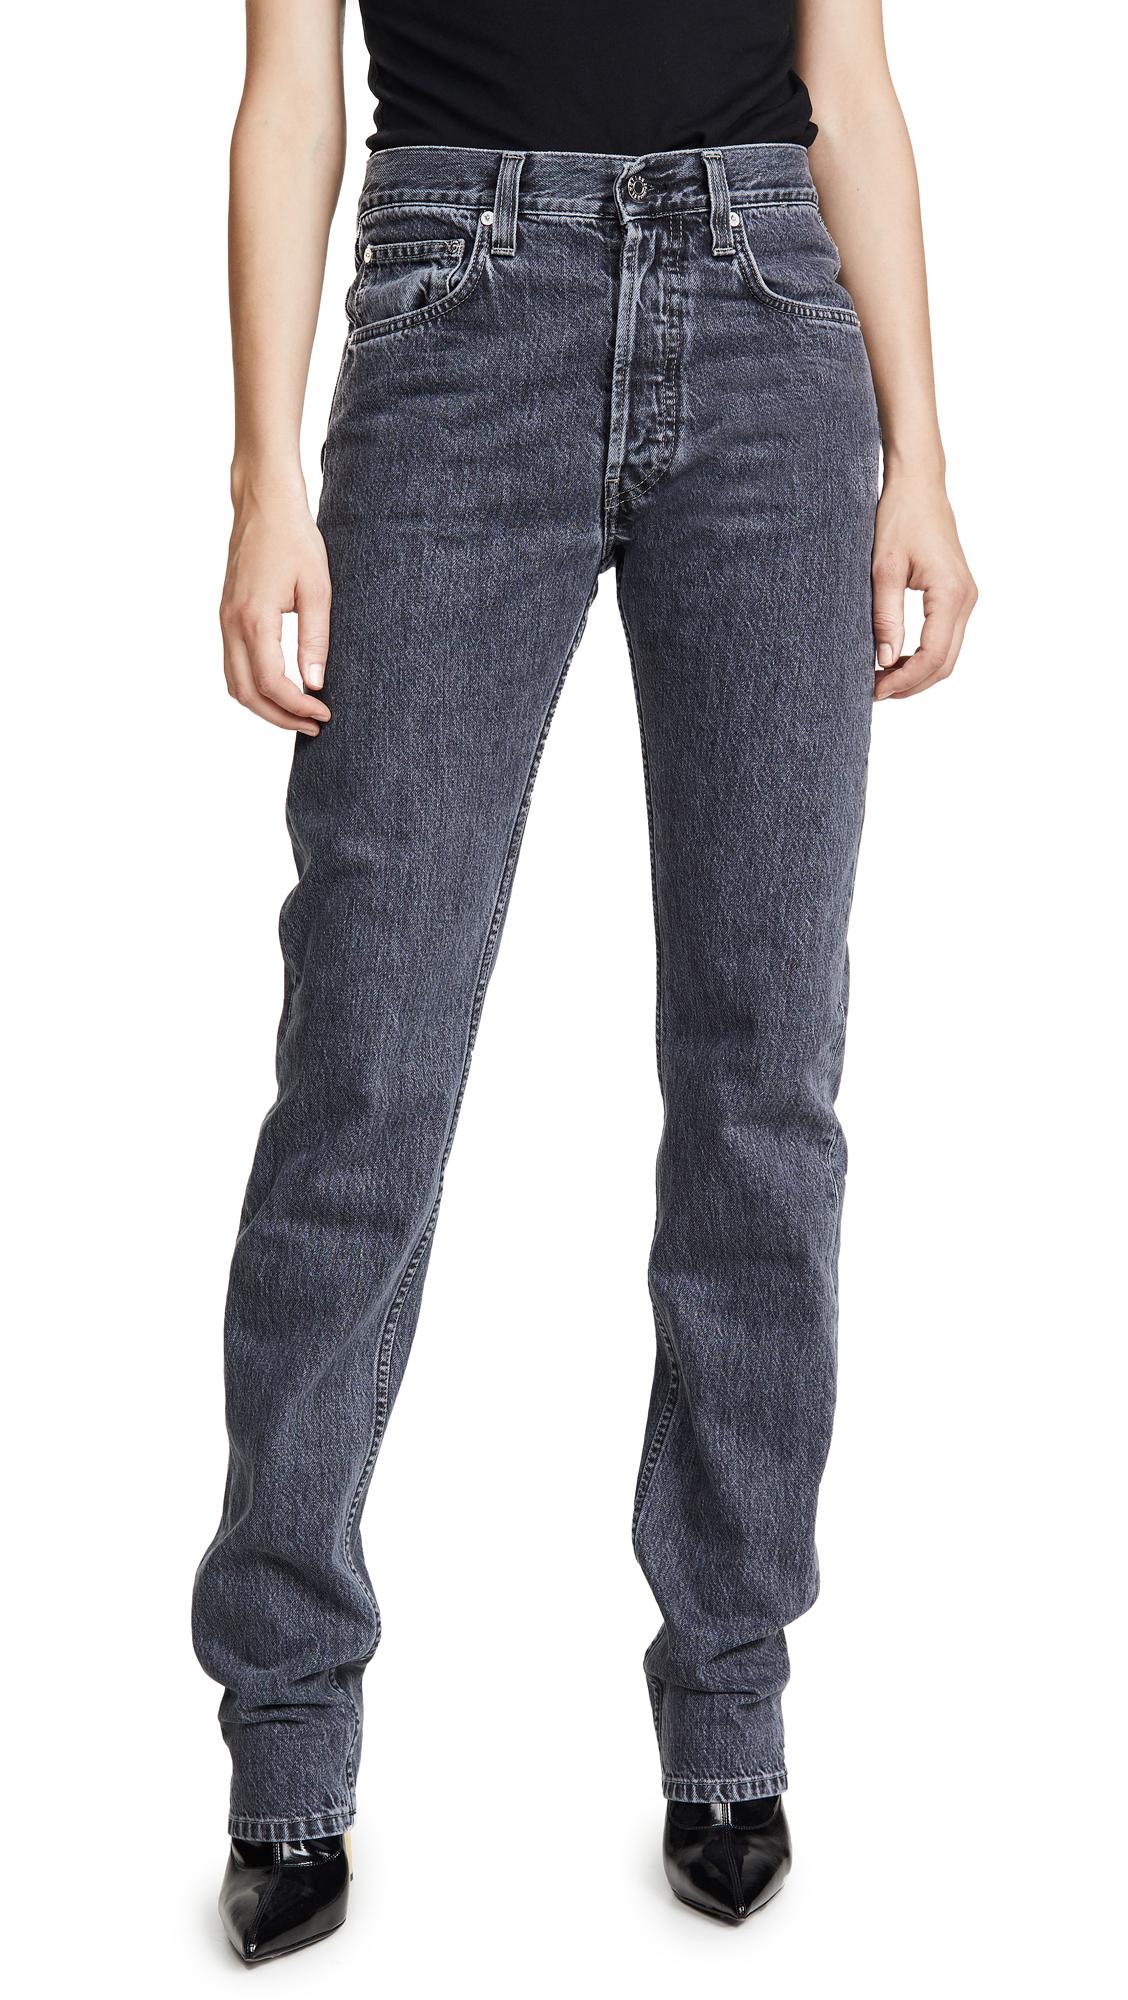 Helmut Lang Masc Hi Straight Leg Jeans - Midnight Stone Universe